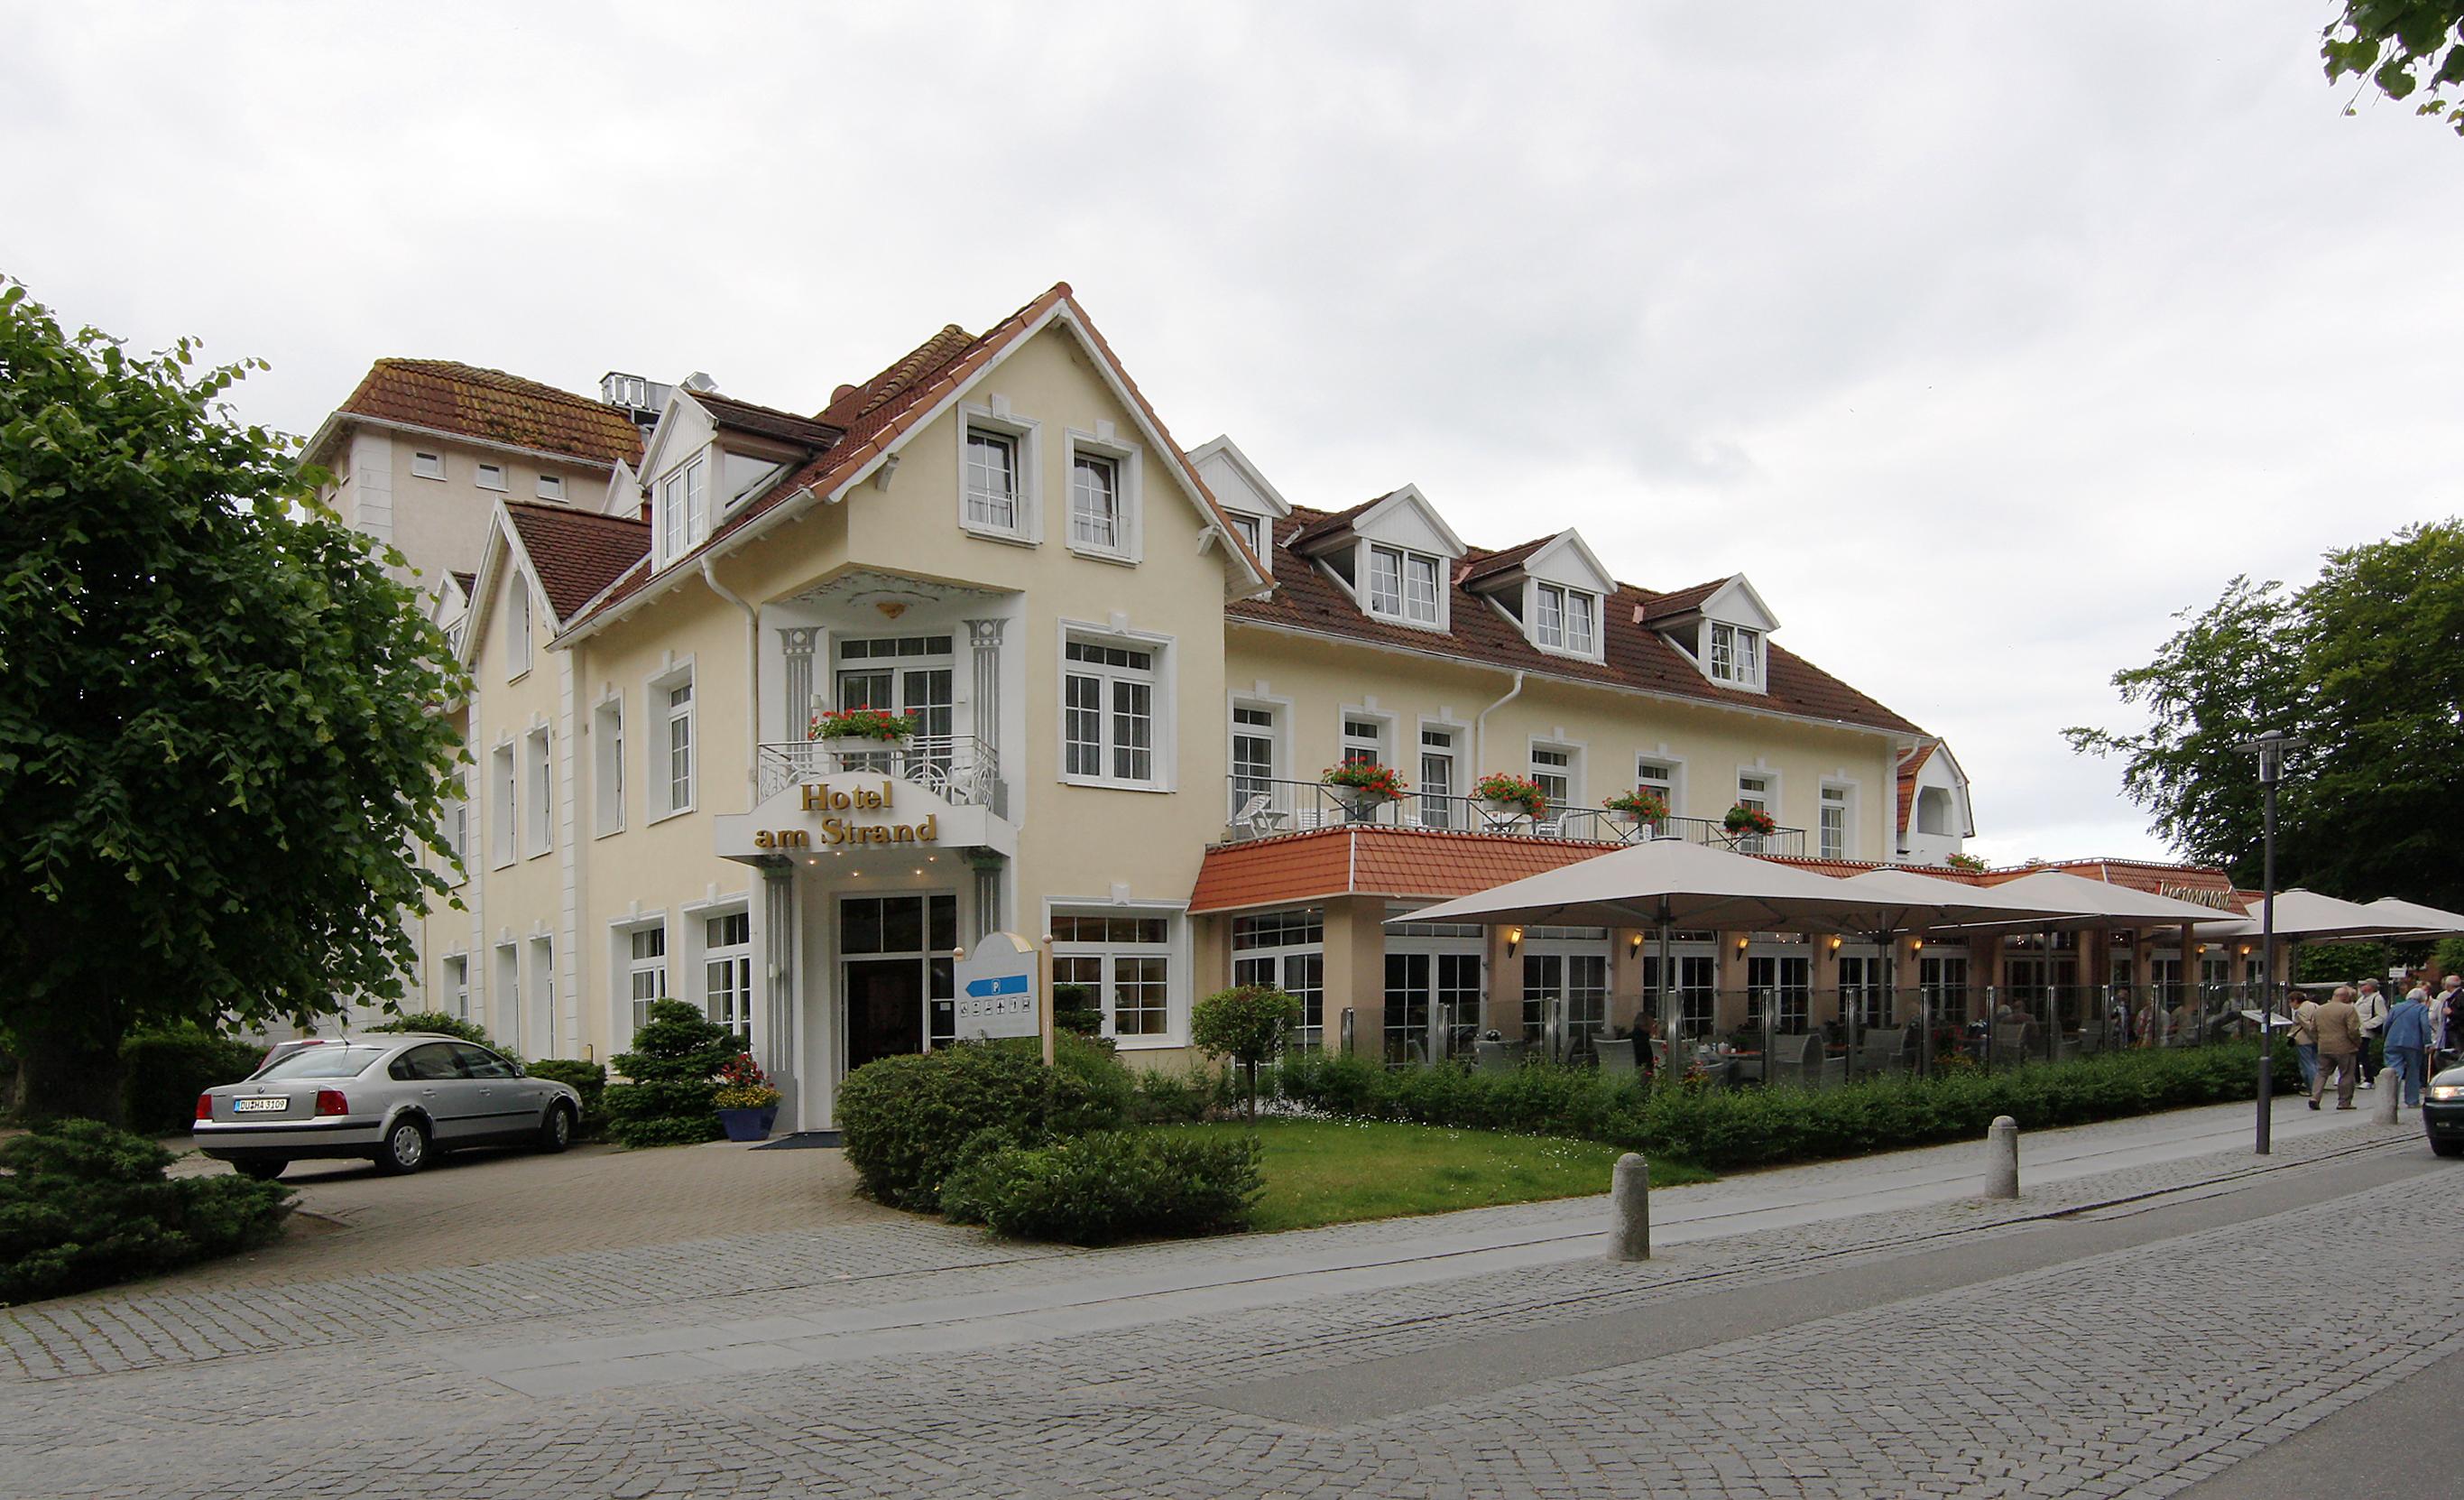 hotel restaurant zur laube bougain villa janert jagdhausstrase baden baden. Black Bedroom Furniture Sets. Home Design Ideas